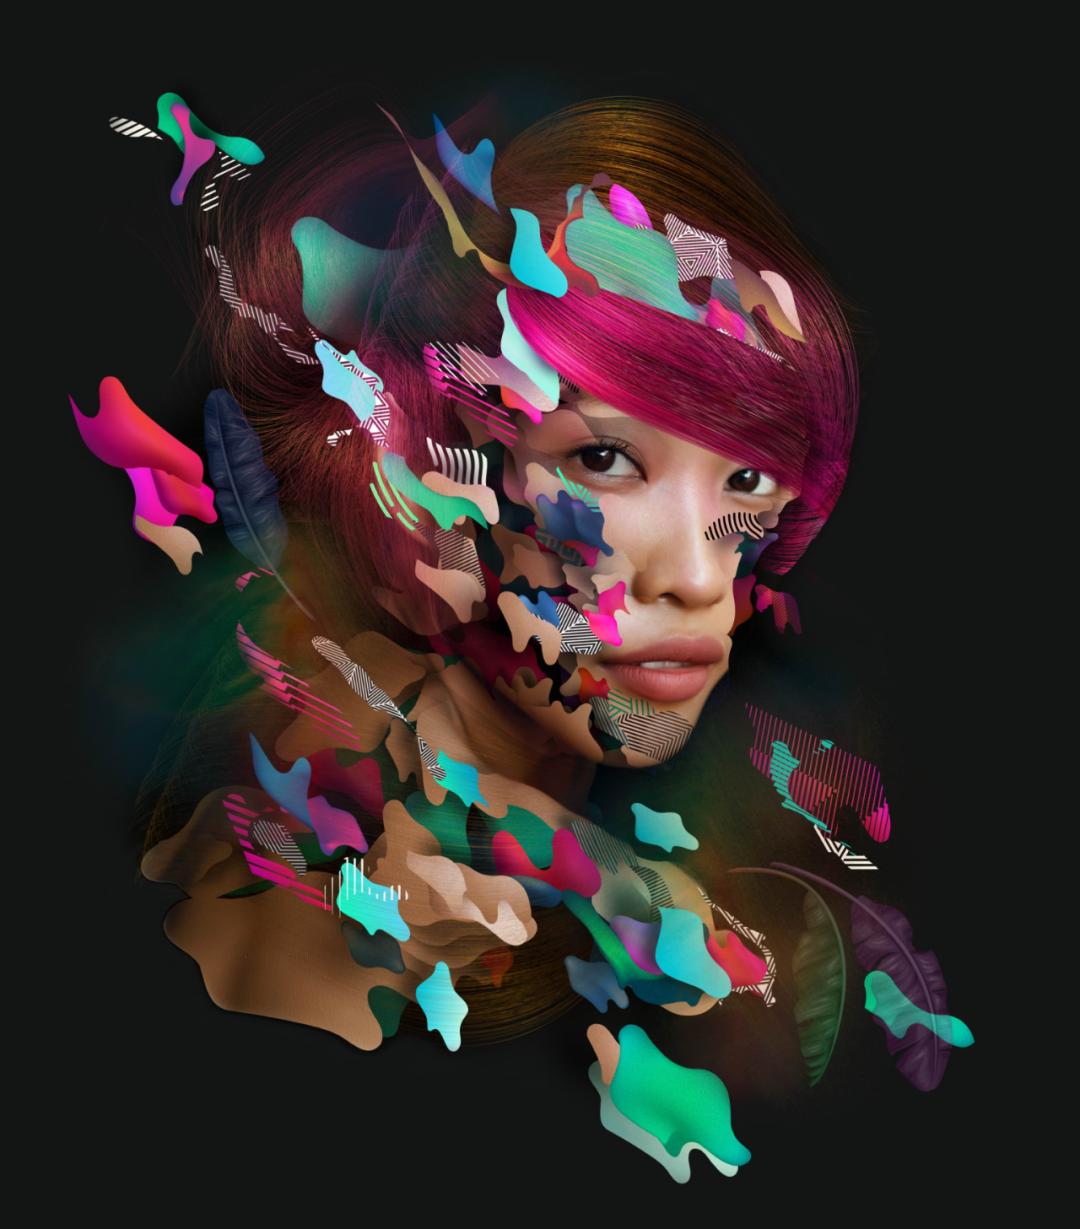 Adobe全球封杀盗版,替代神器套装Affinity Photo软件已上线【758期】插图10